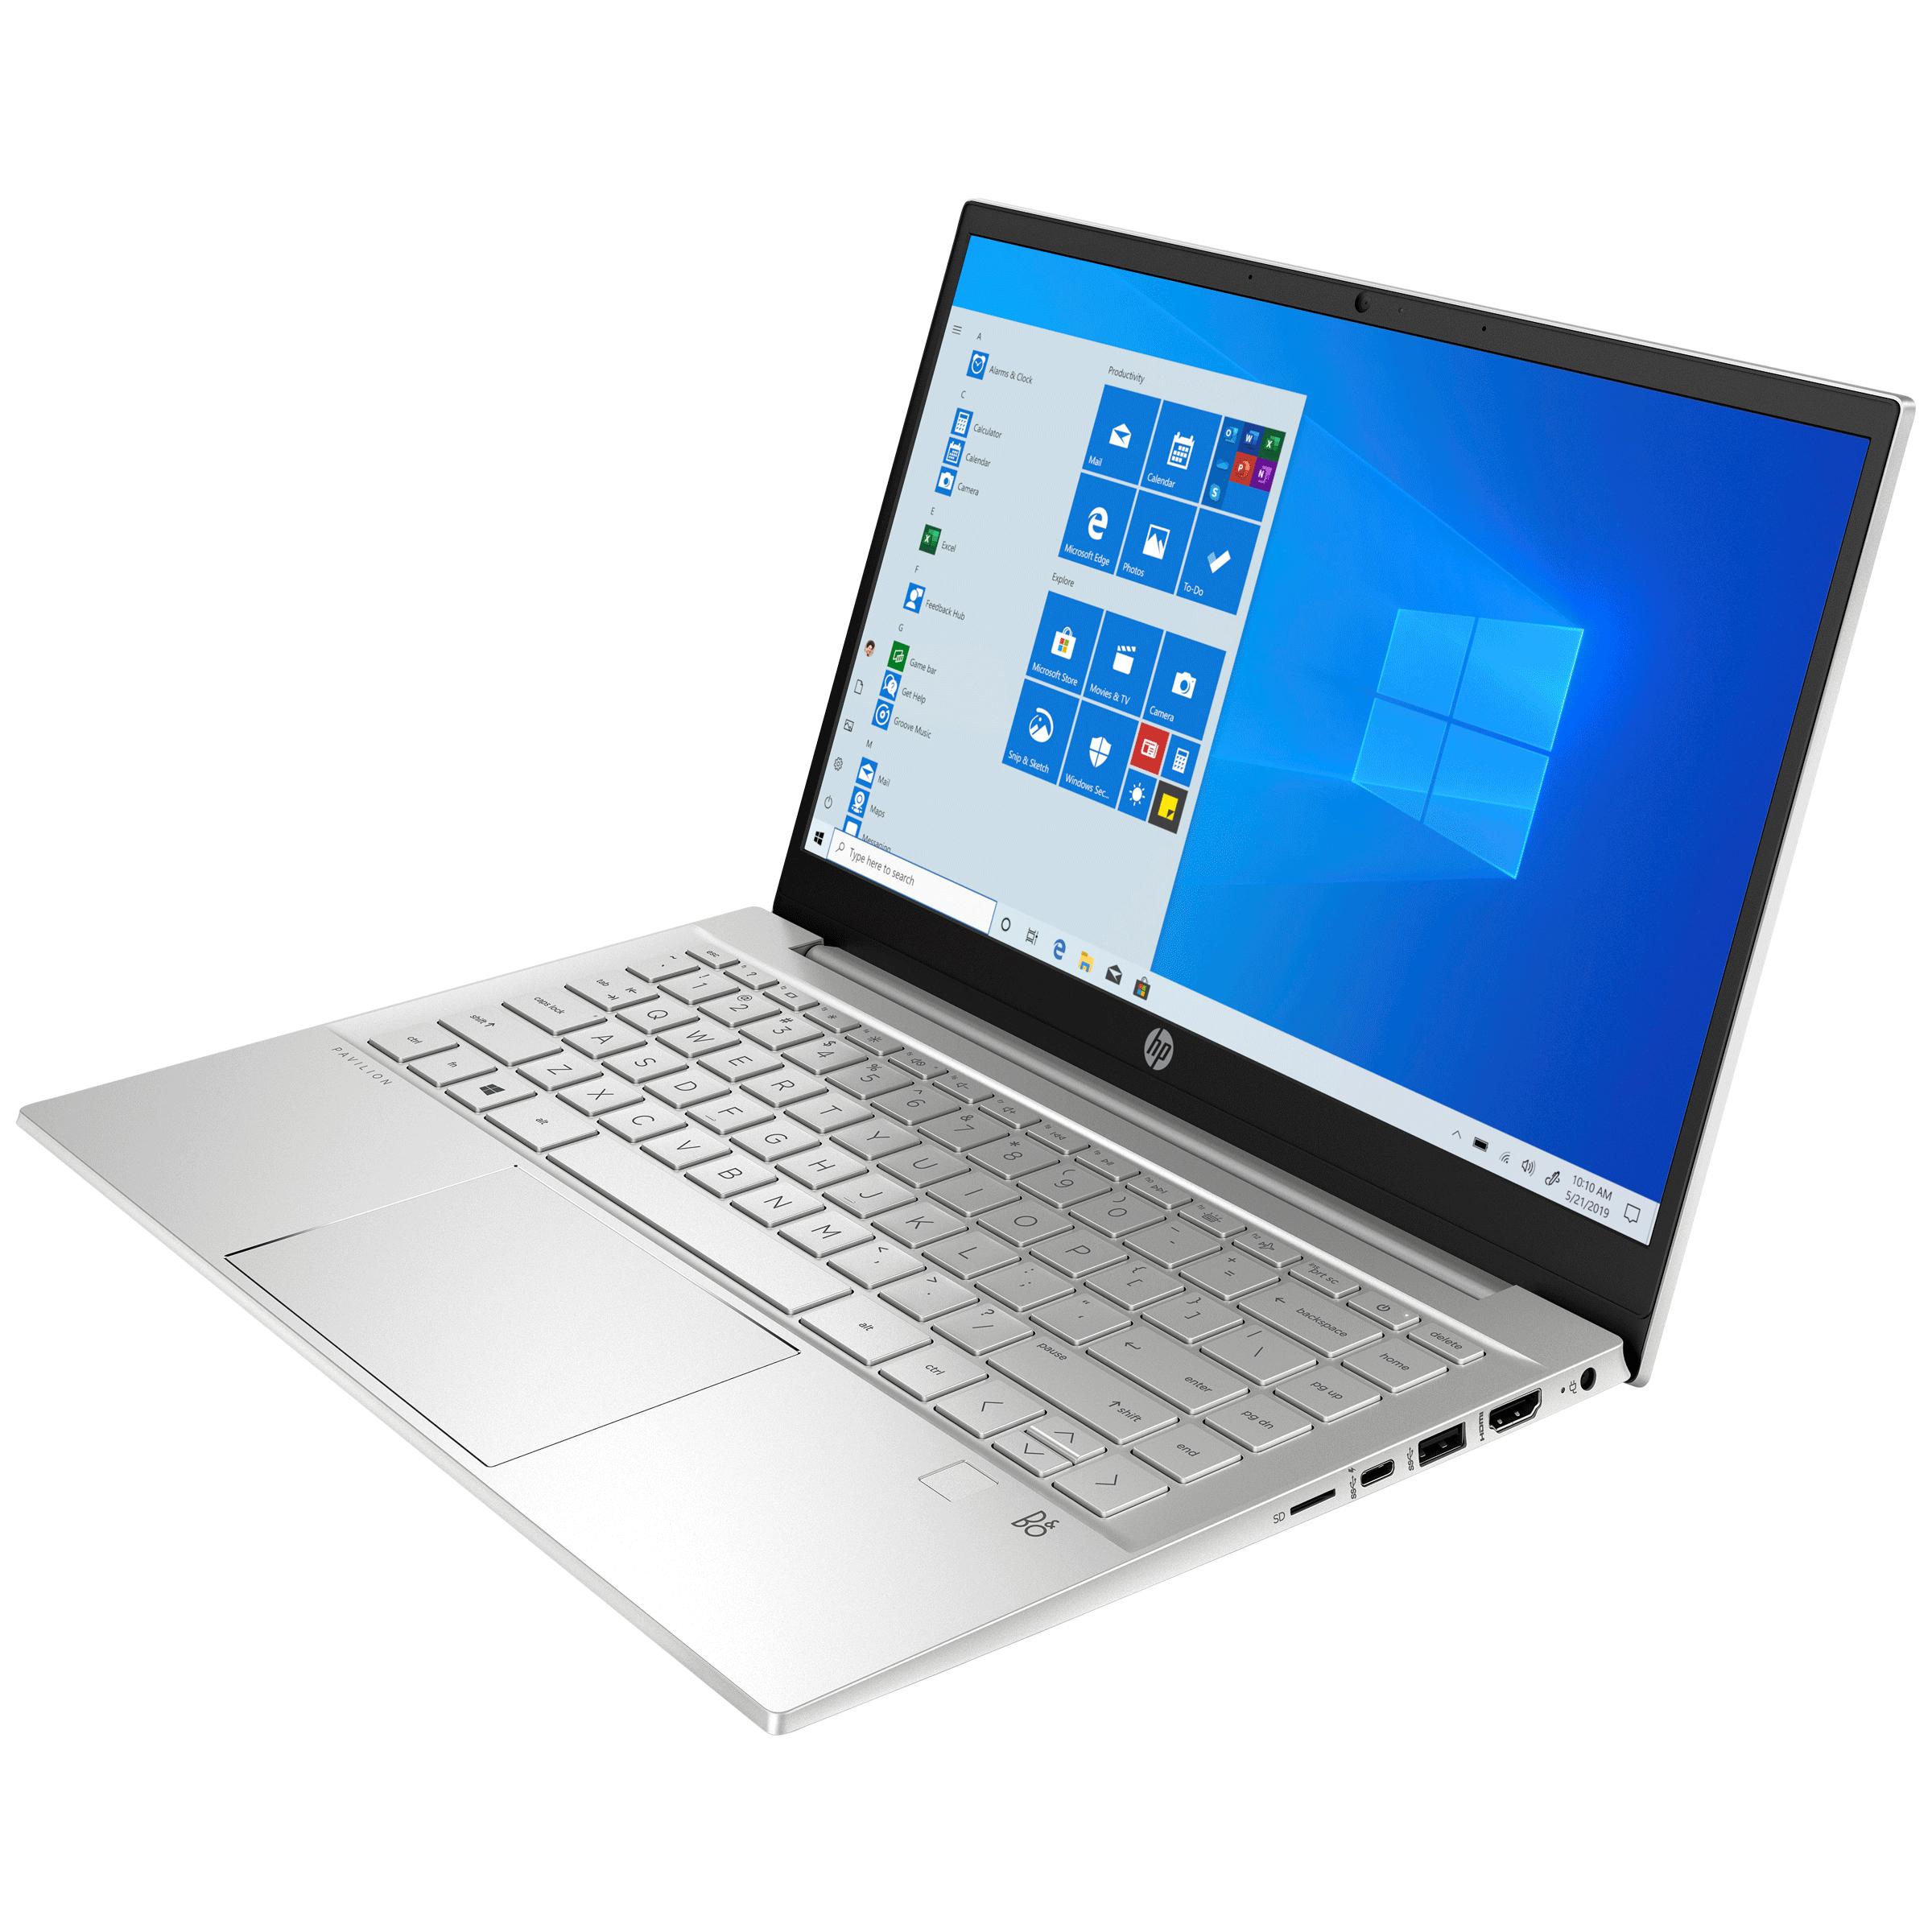 HP Pavilion 14-dv0086TX (397L9PA#ACJ) Core i5 11th Gen Windows 10 Home Laptop (16GB RAM, 512GB SSD, GeForce MX450 + 2GB Graphics, MS Office,... 3